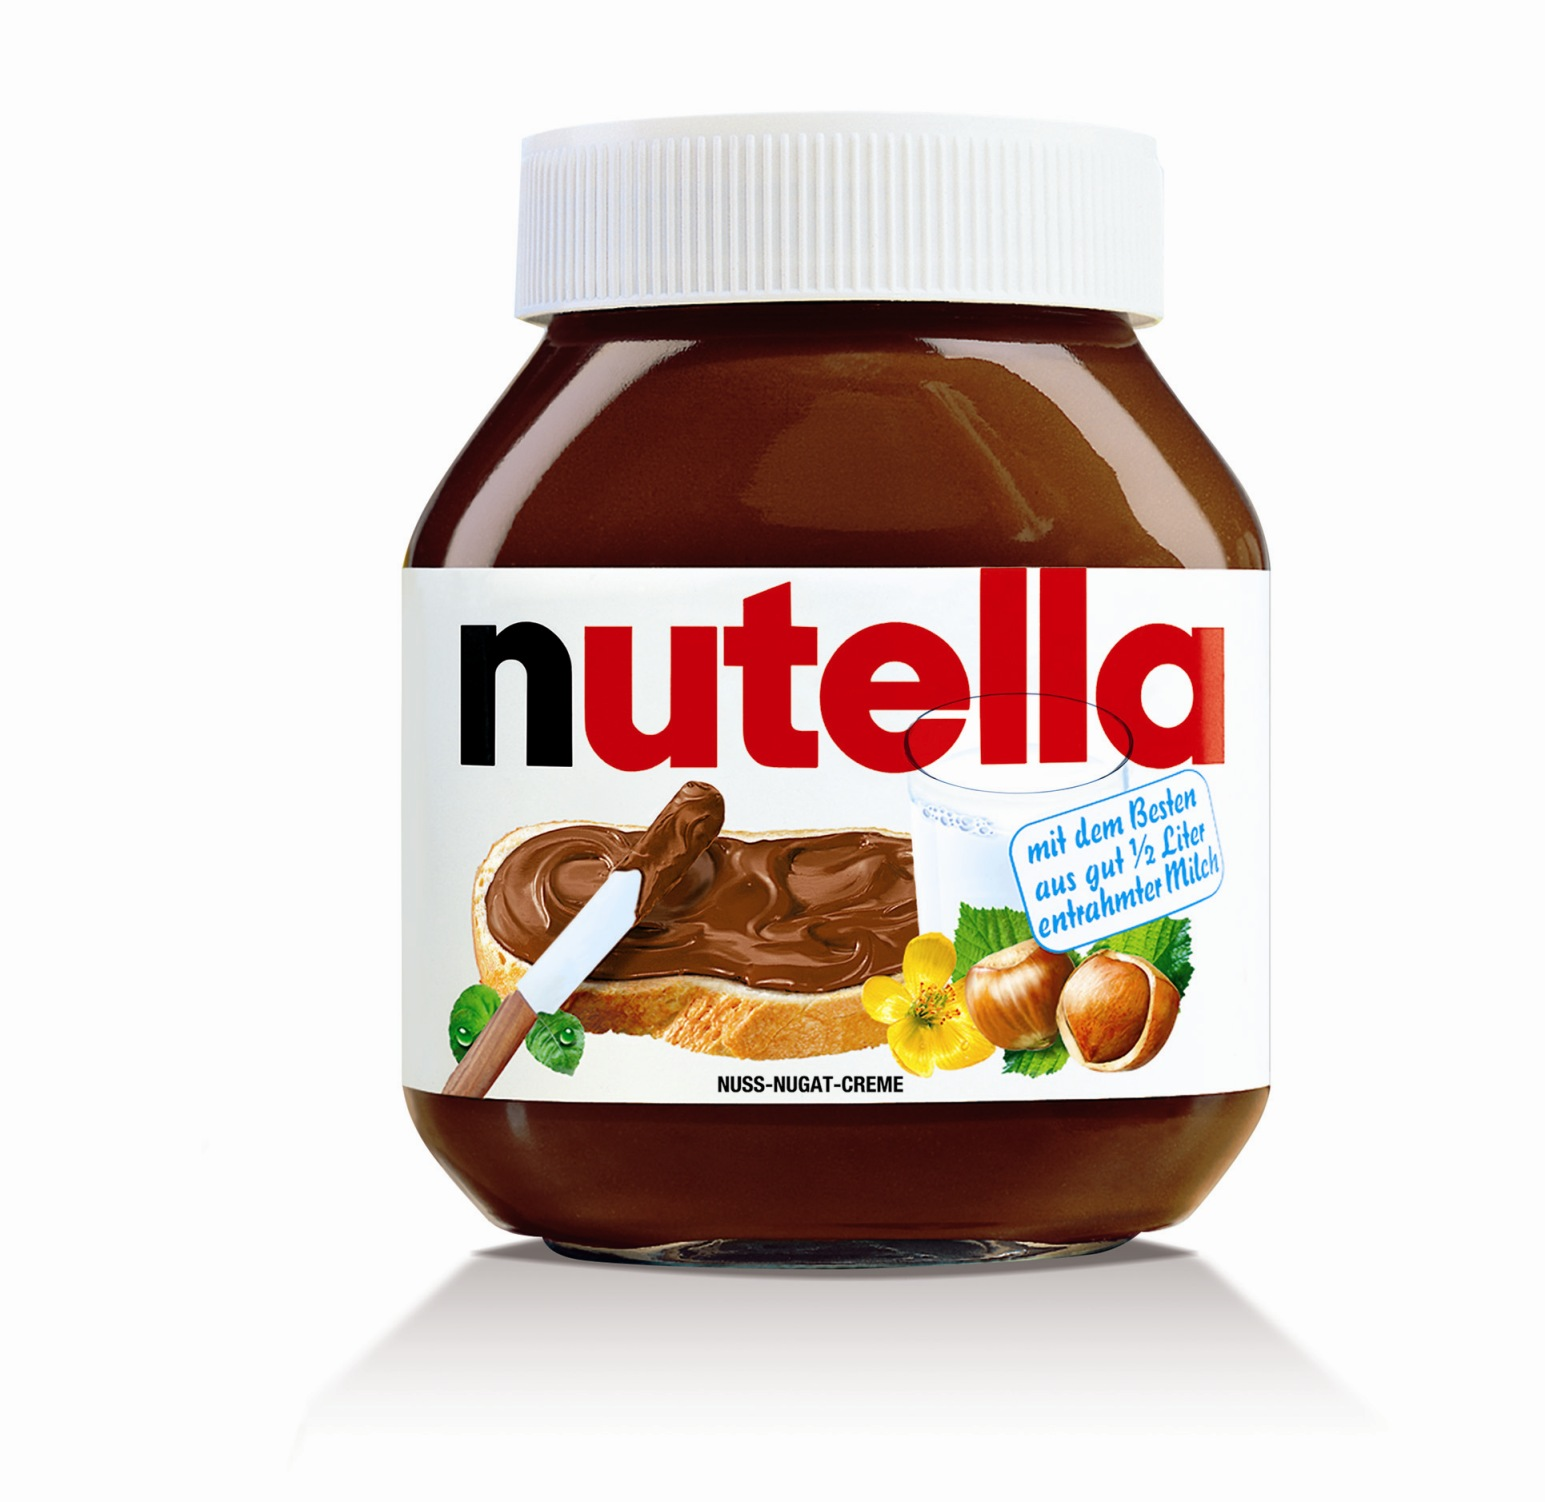 Free Nutella At Walmart!